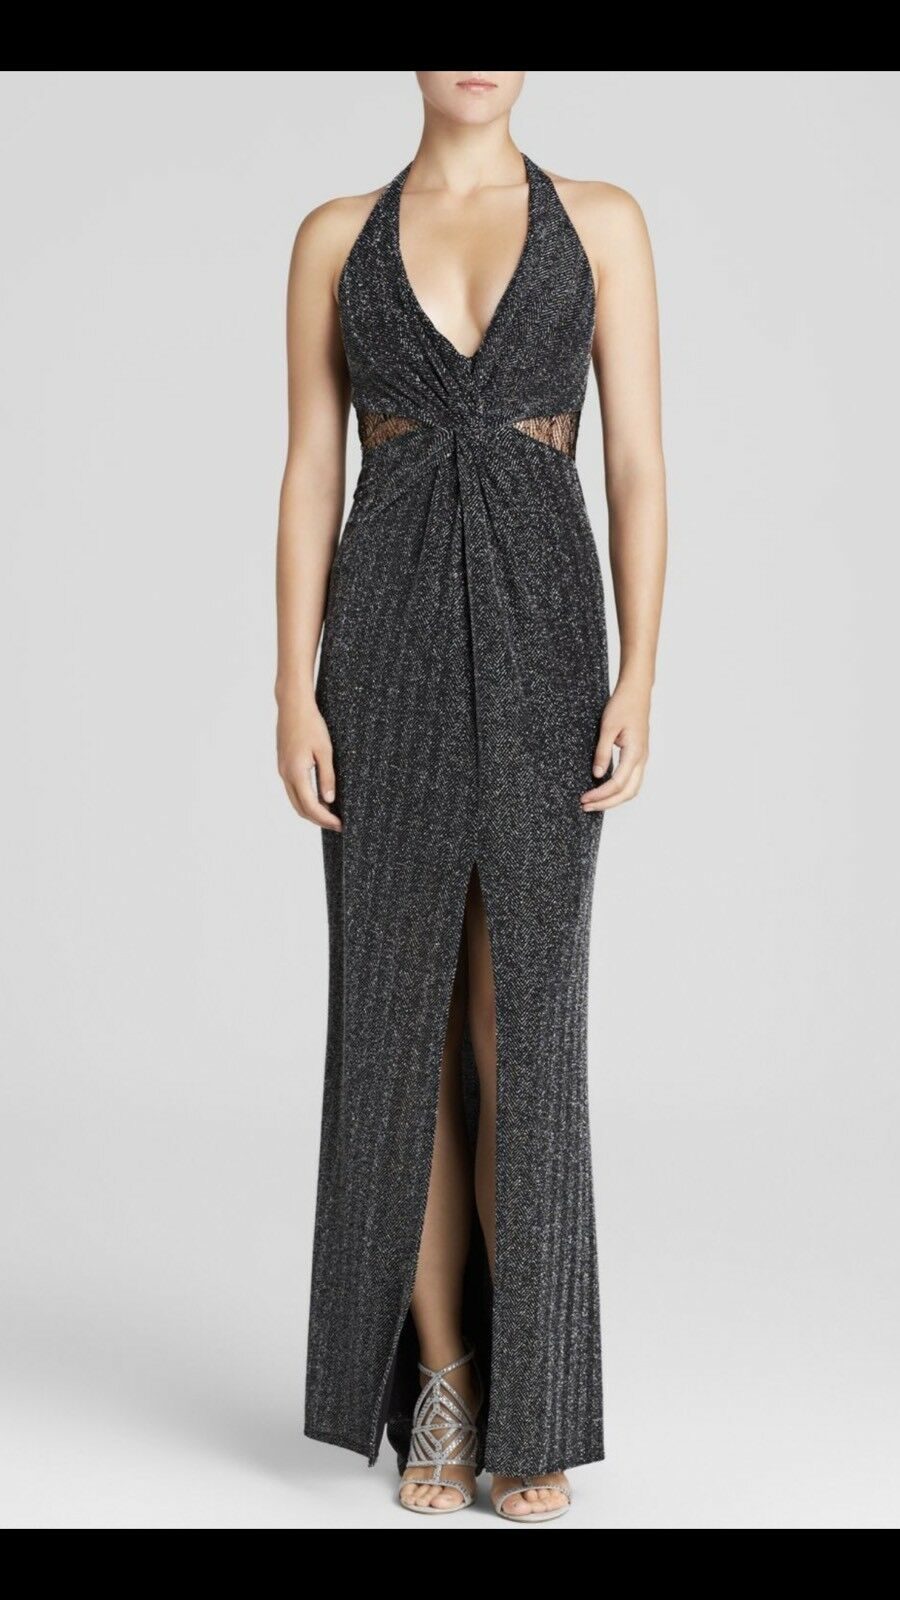 ABS by Allen Schwartz Sleeveless V Neck Metallic Herringbone Cutout Dress Gown S